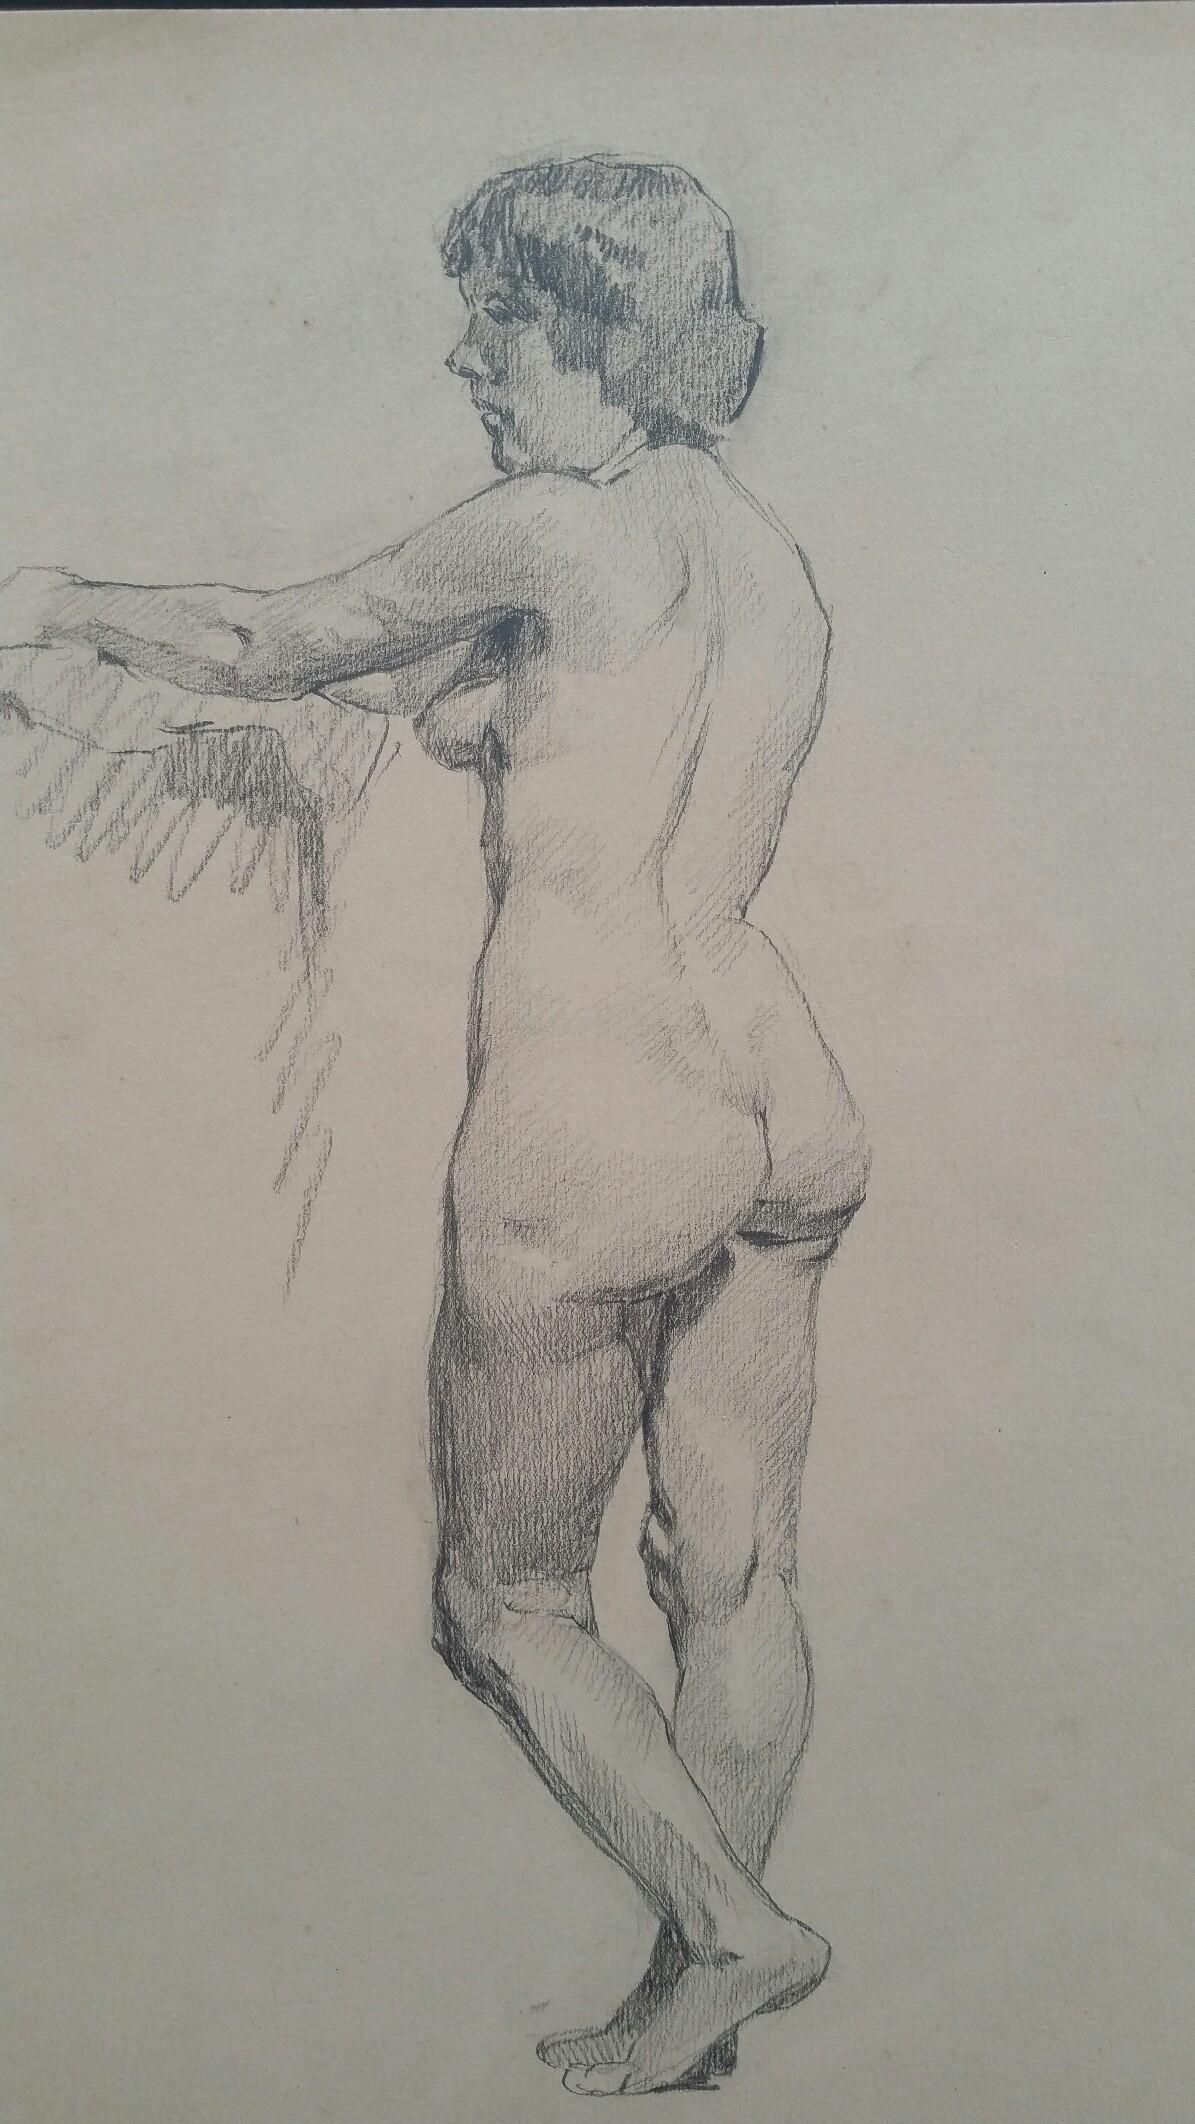 English Graphite Portrait Sketch of Female Nude, Standing